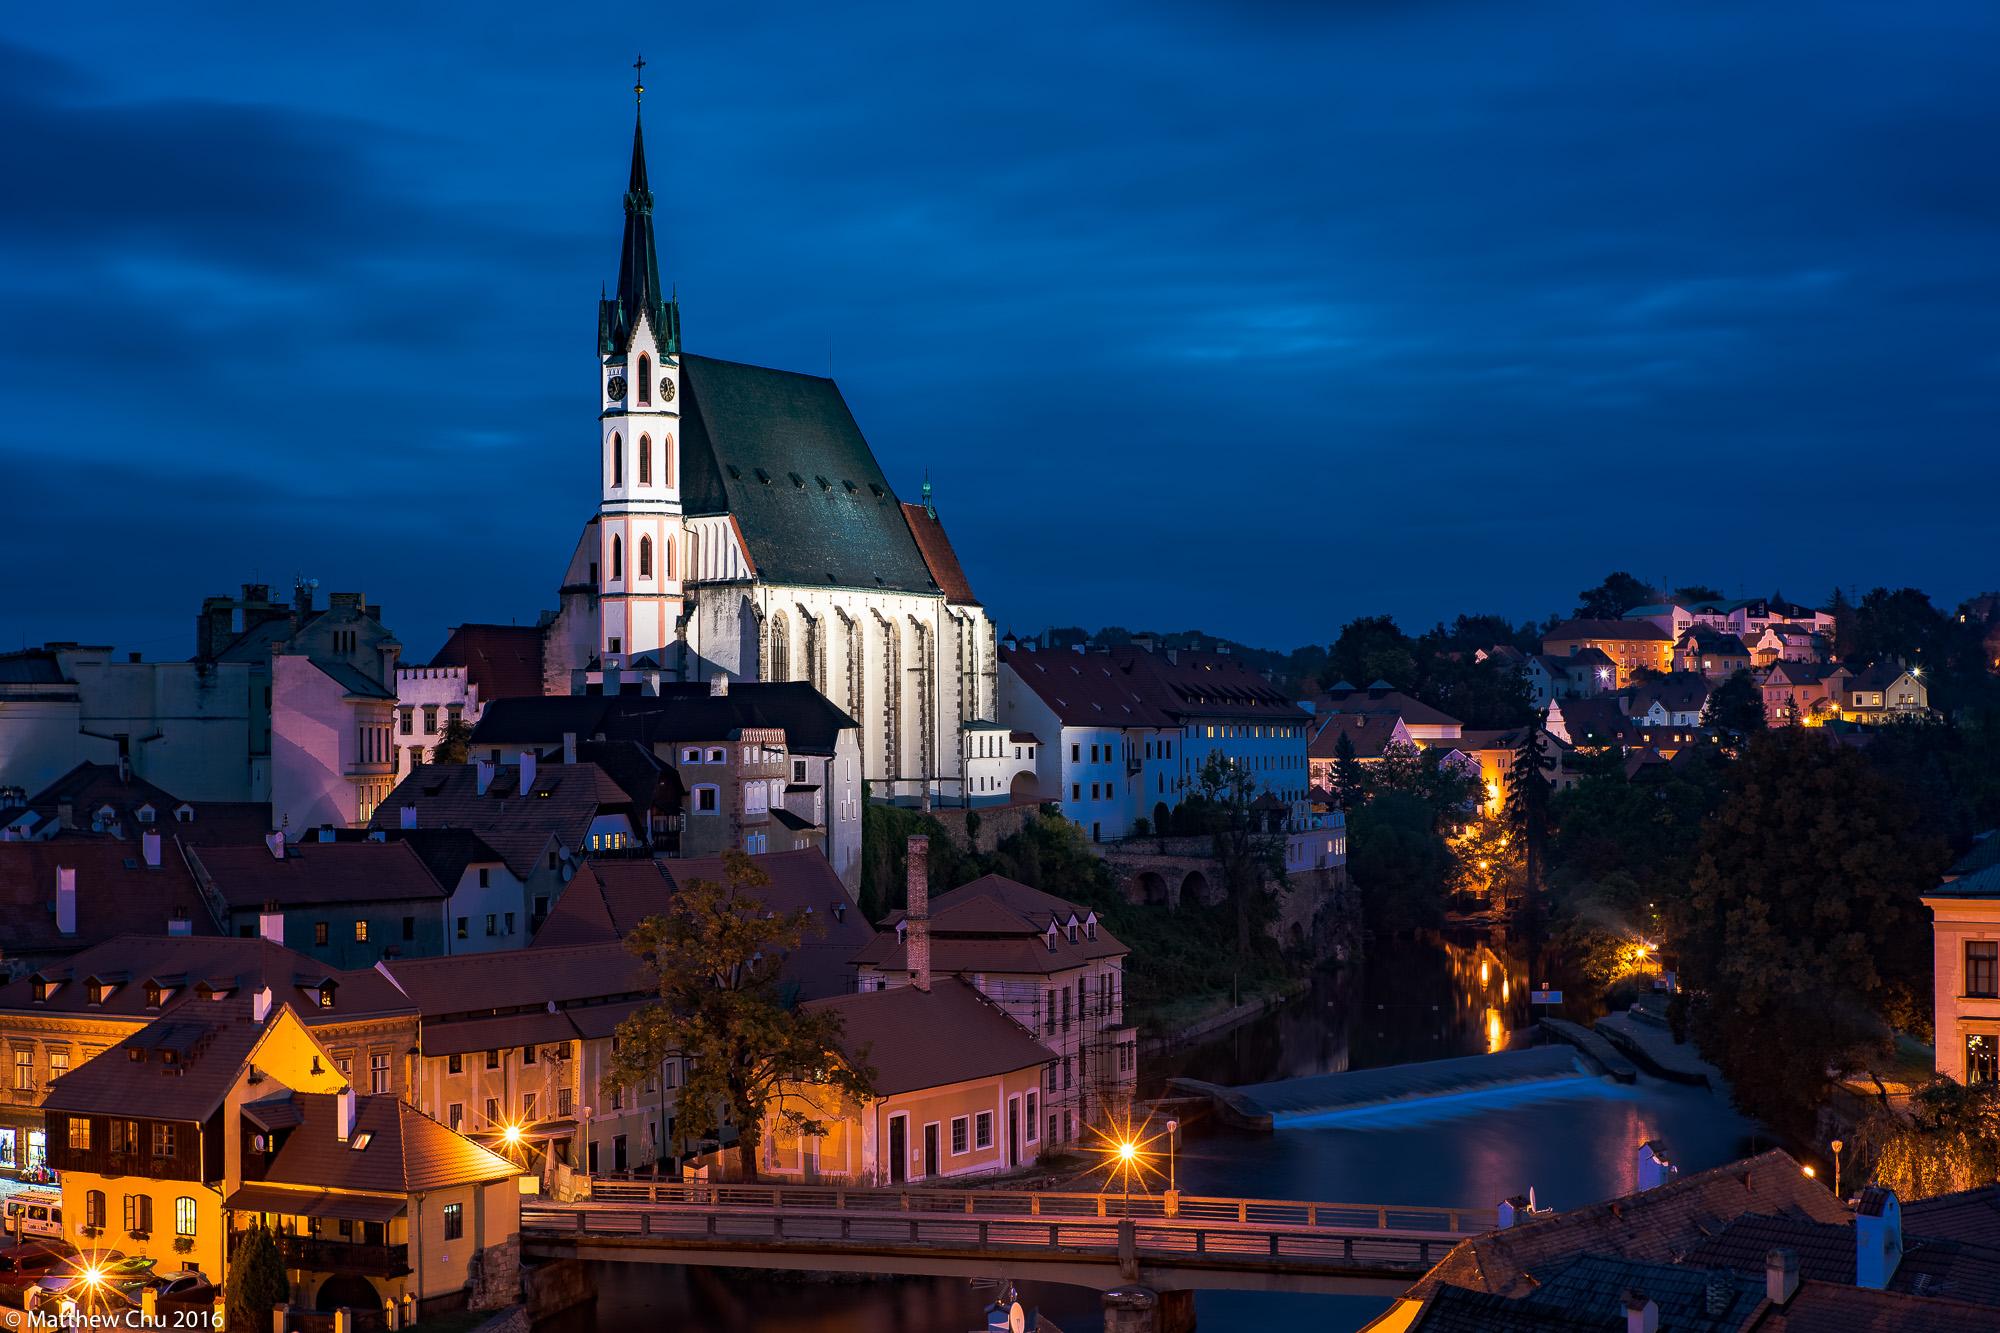 View of Church of St. Vitus, Cesky Krumlov, Czech Republic